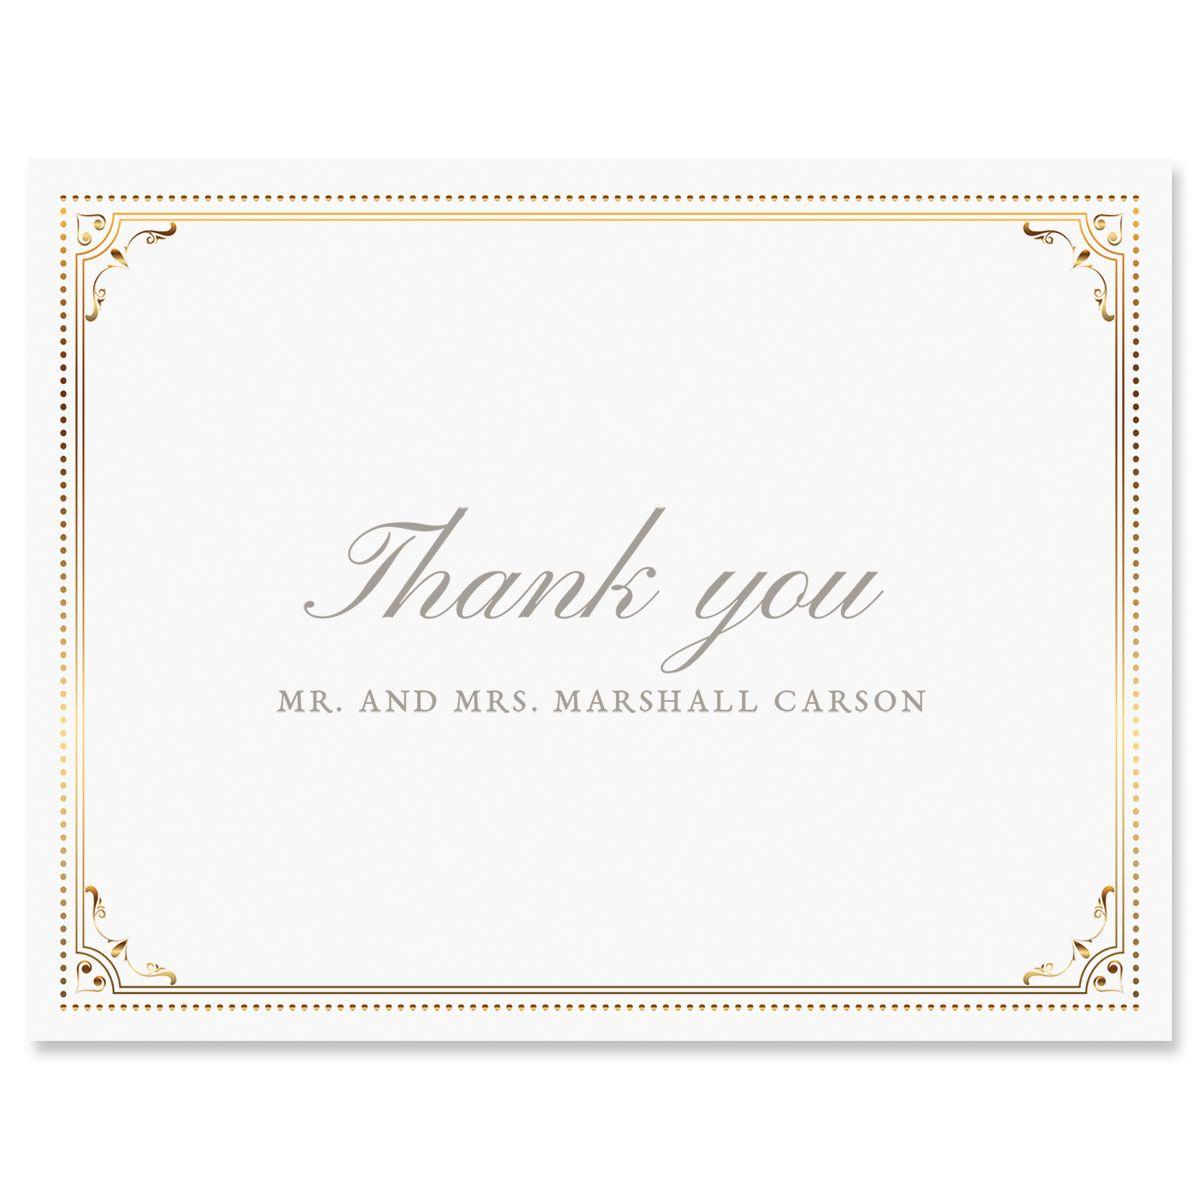 Custom Gold Frame Thank You Cards